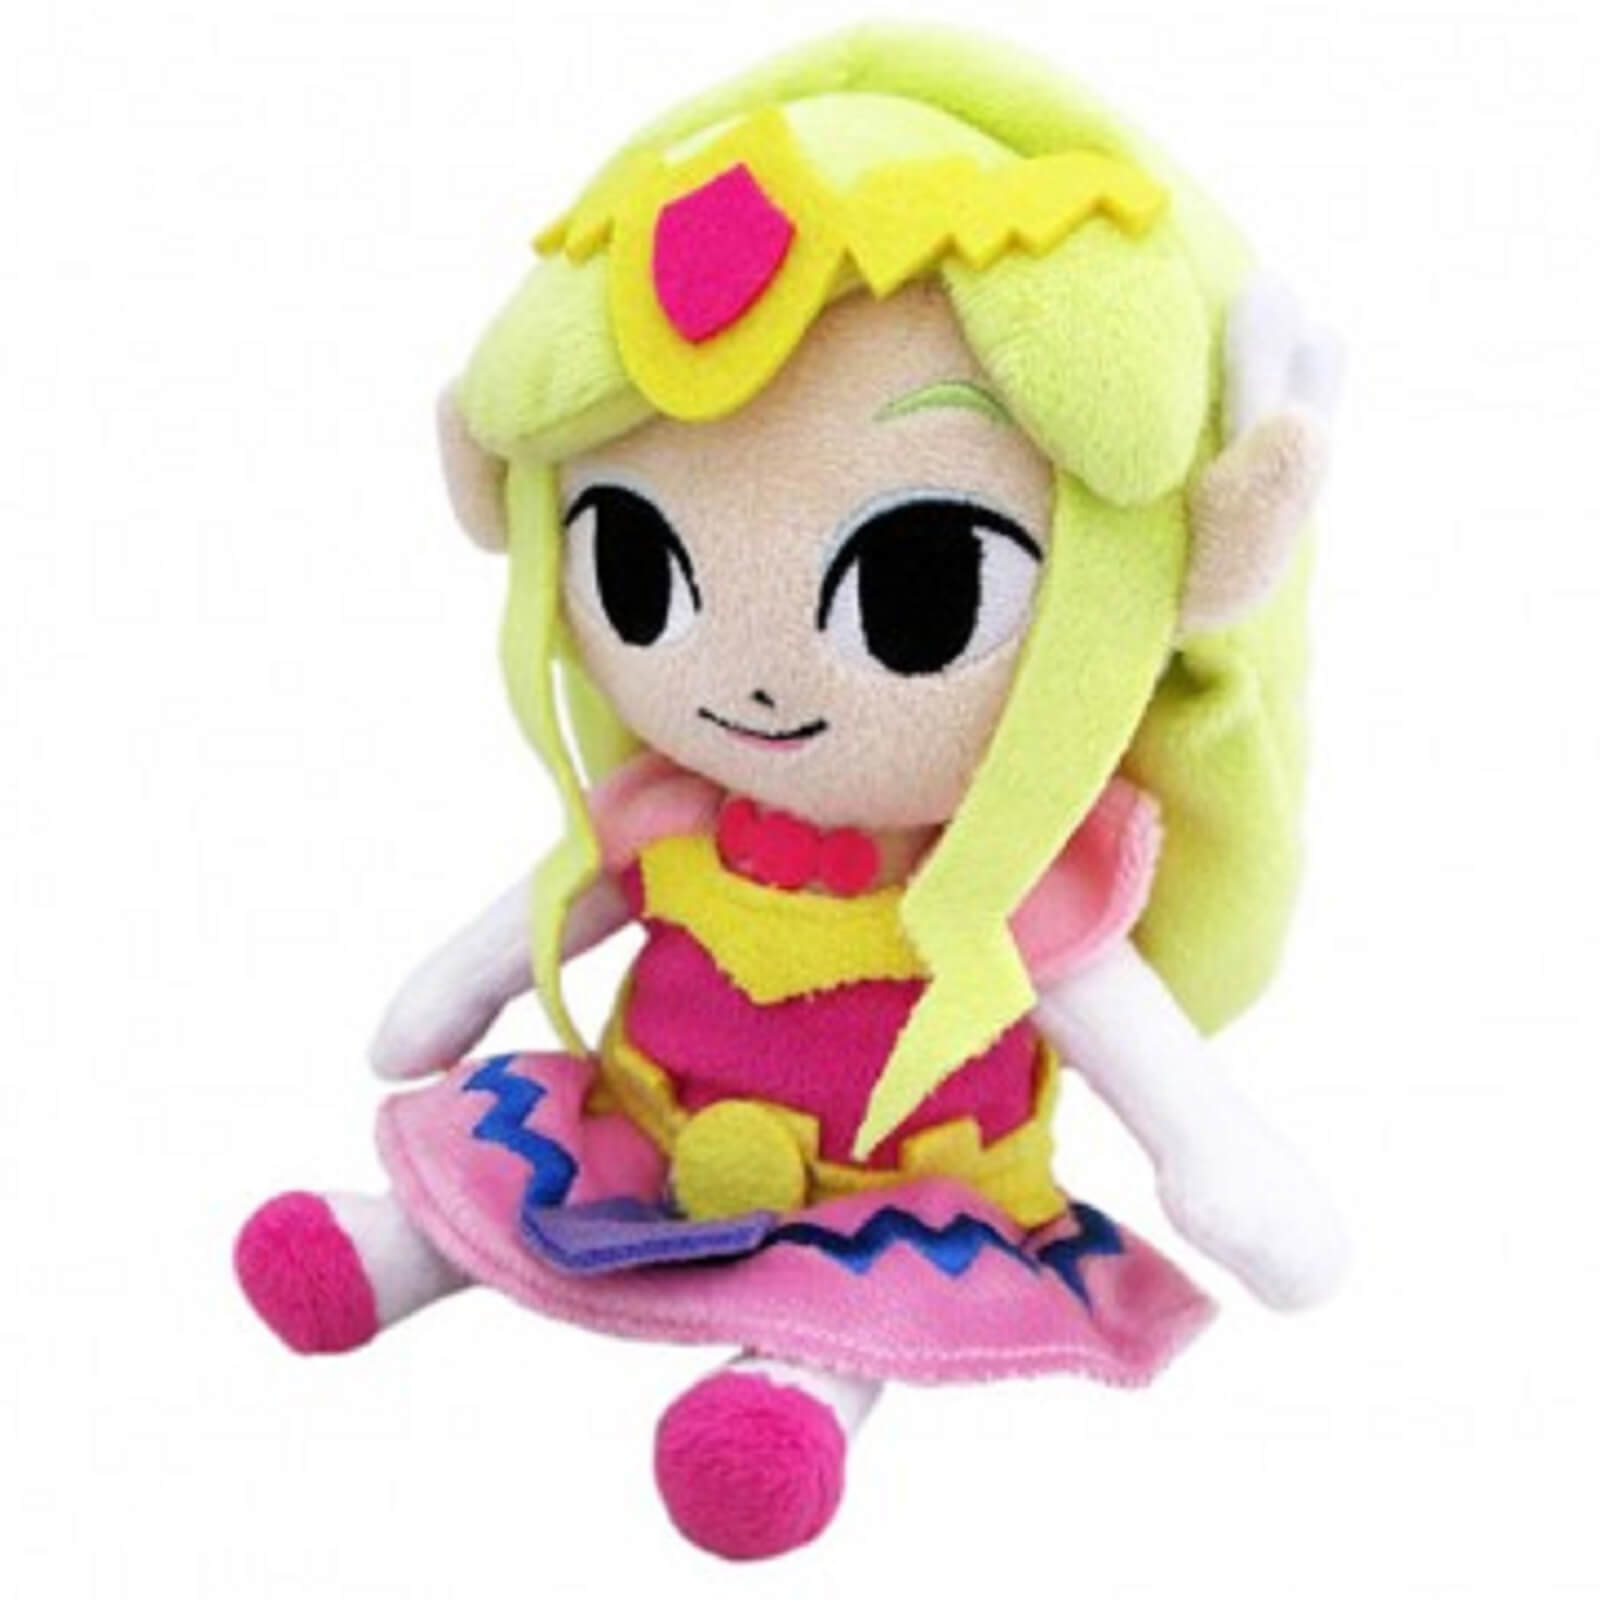 Image of The Legend of Zelda - Princess Plush 18cm